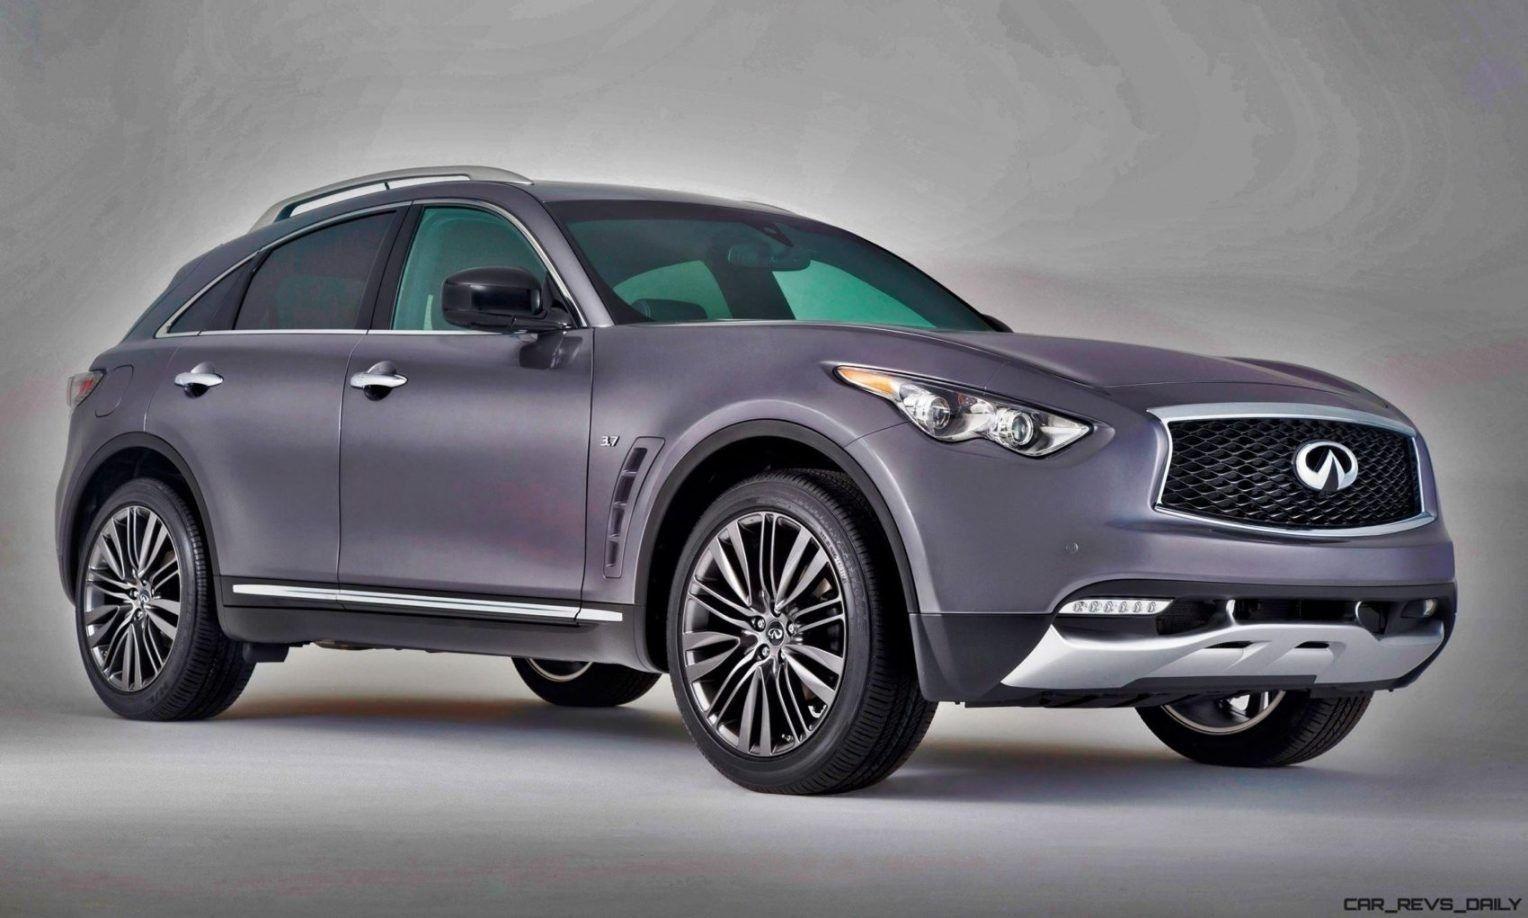 2019 Infiniti Suv Qx70 Release Date Car, Car photos, Car